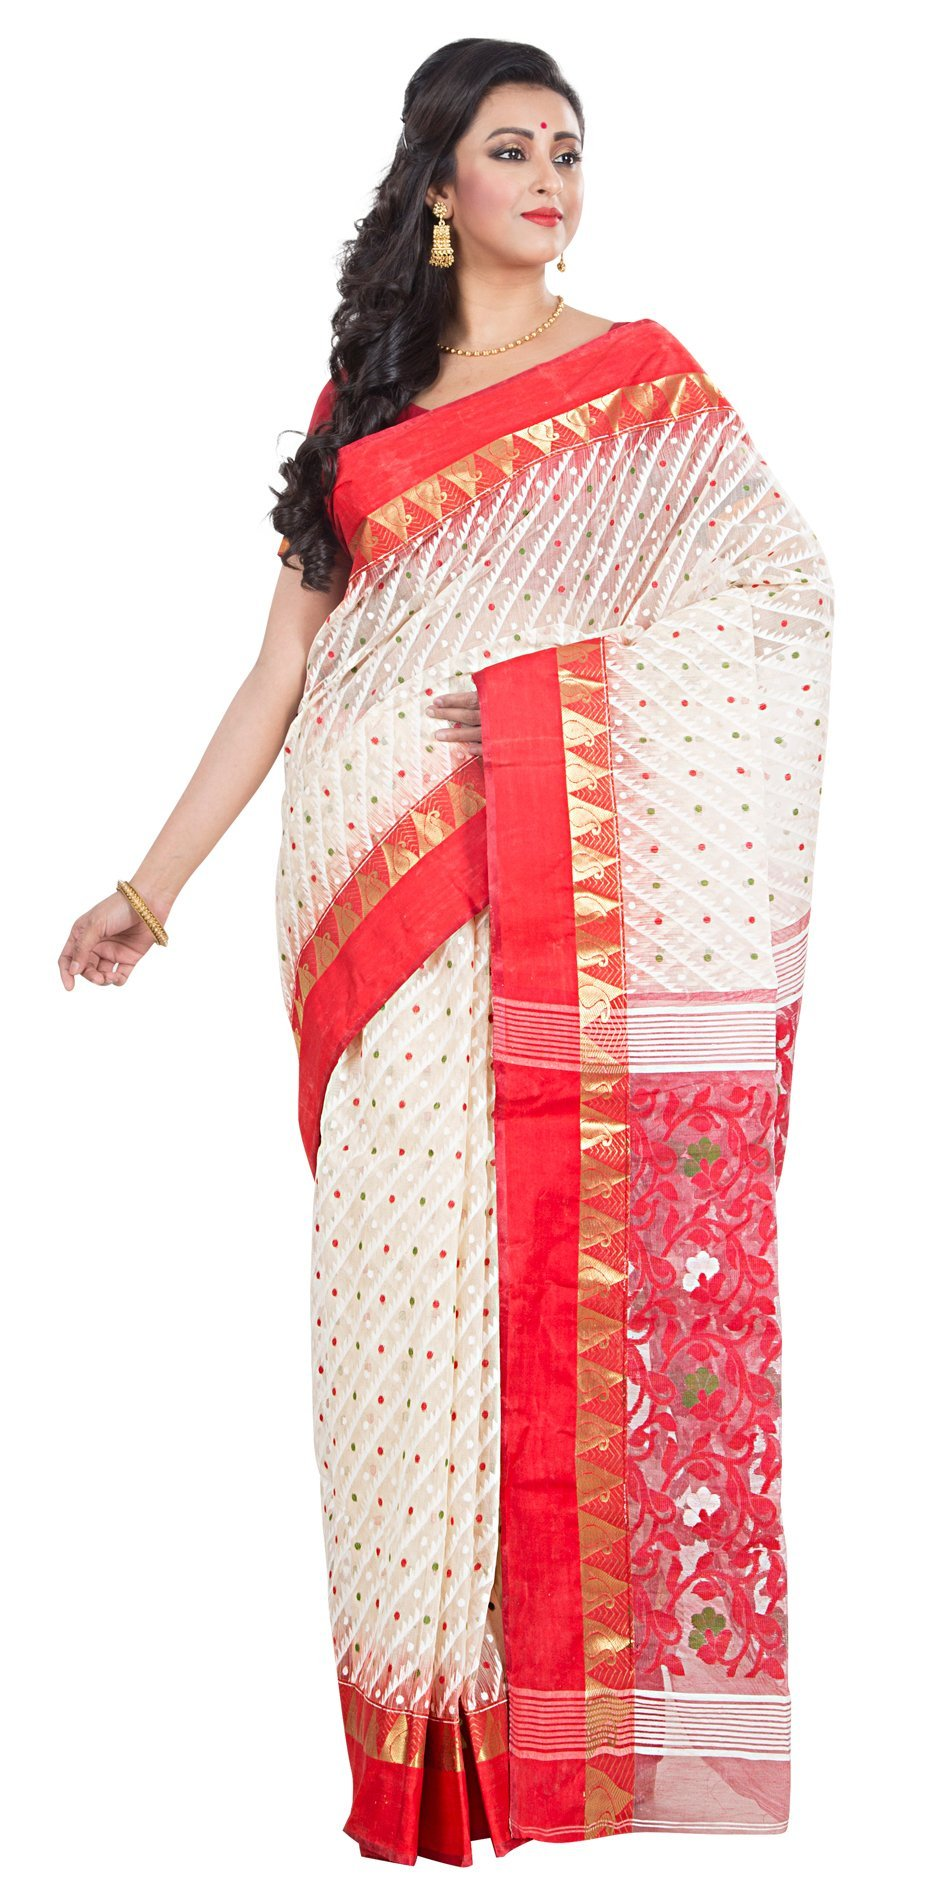 RLB Fashion Women's Cotton Silk Handloom Dhakai Jamdani Saree Free Size Red & White